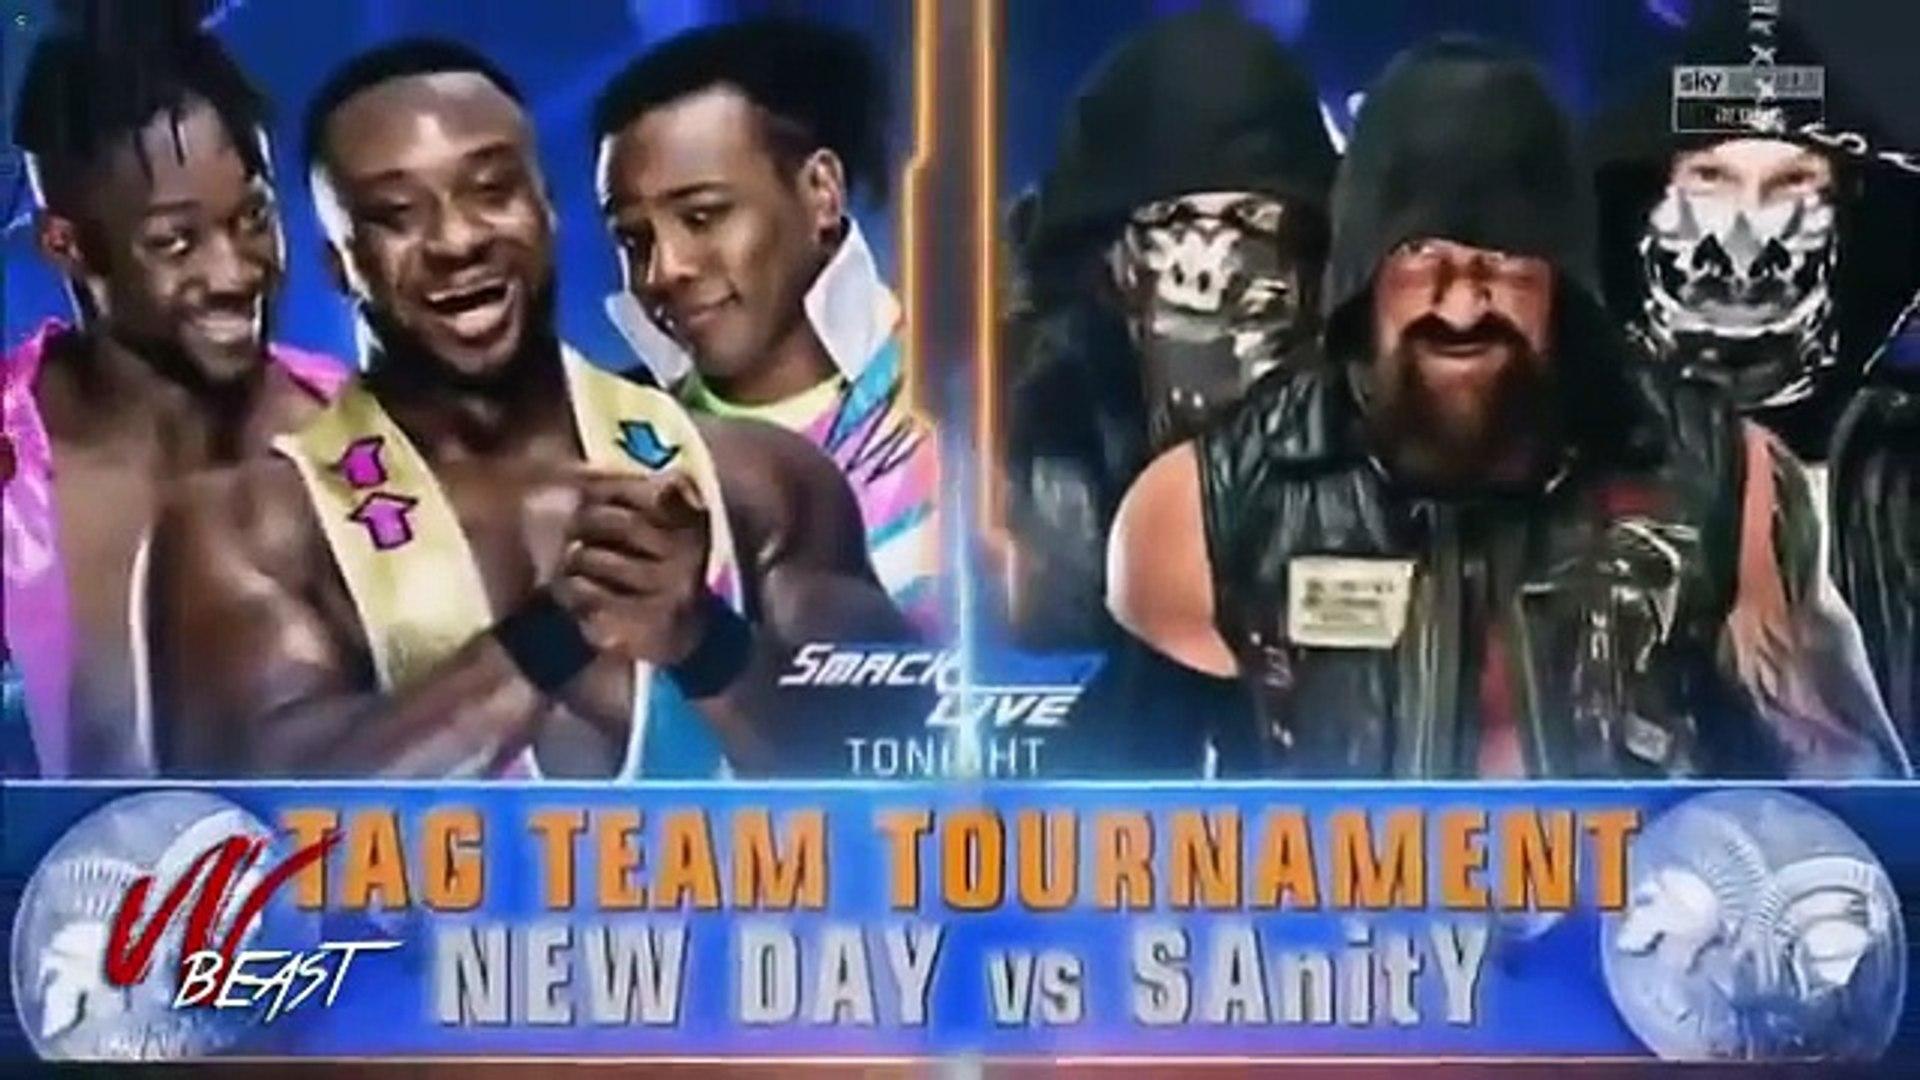 WWE Smackdown 7/24/2018 Highlights HD WWE Smackdown 24th July 2018 Highlights HD